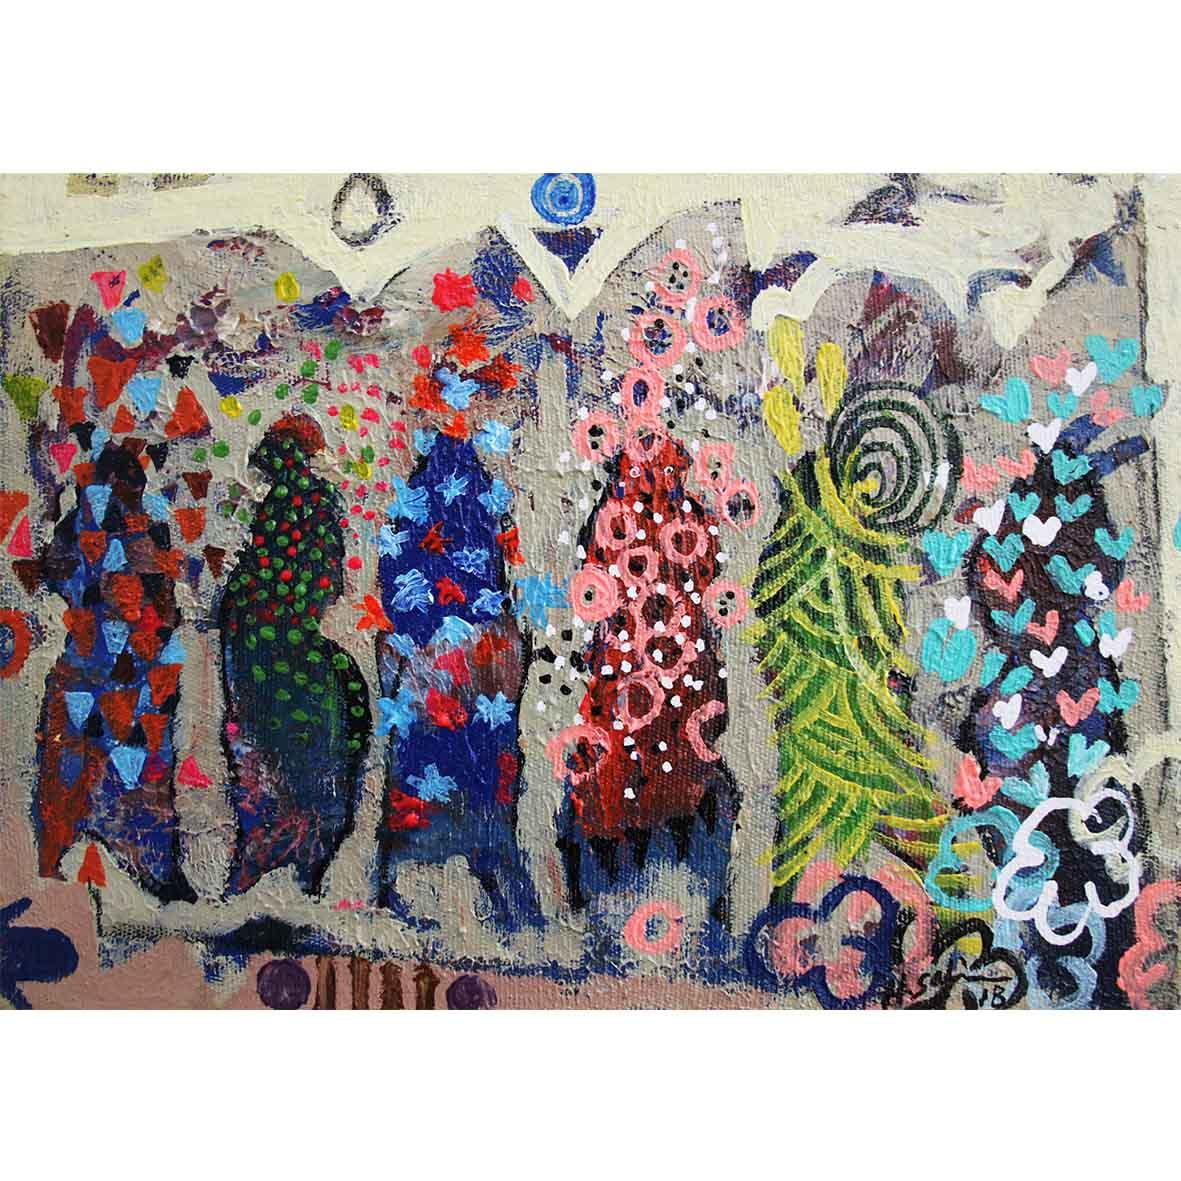 Hussein Salim Untitled (HS194) 2018 Acrylic on Canvas 19 x 27 cm